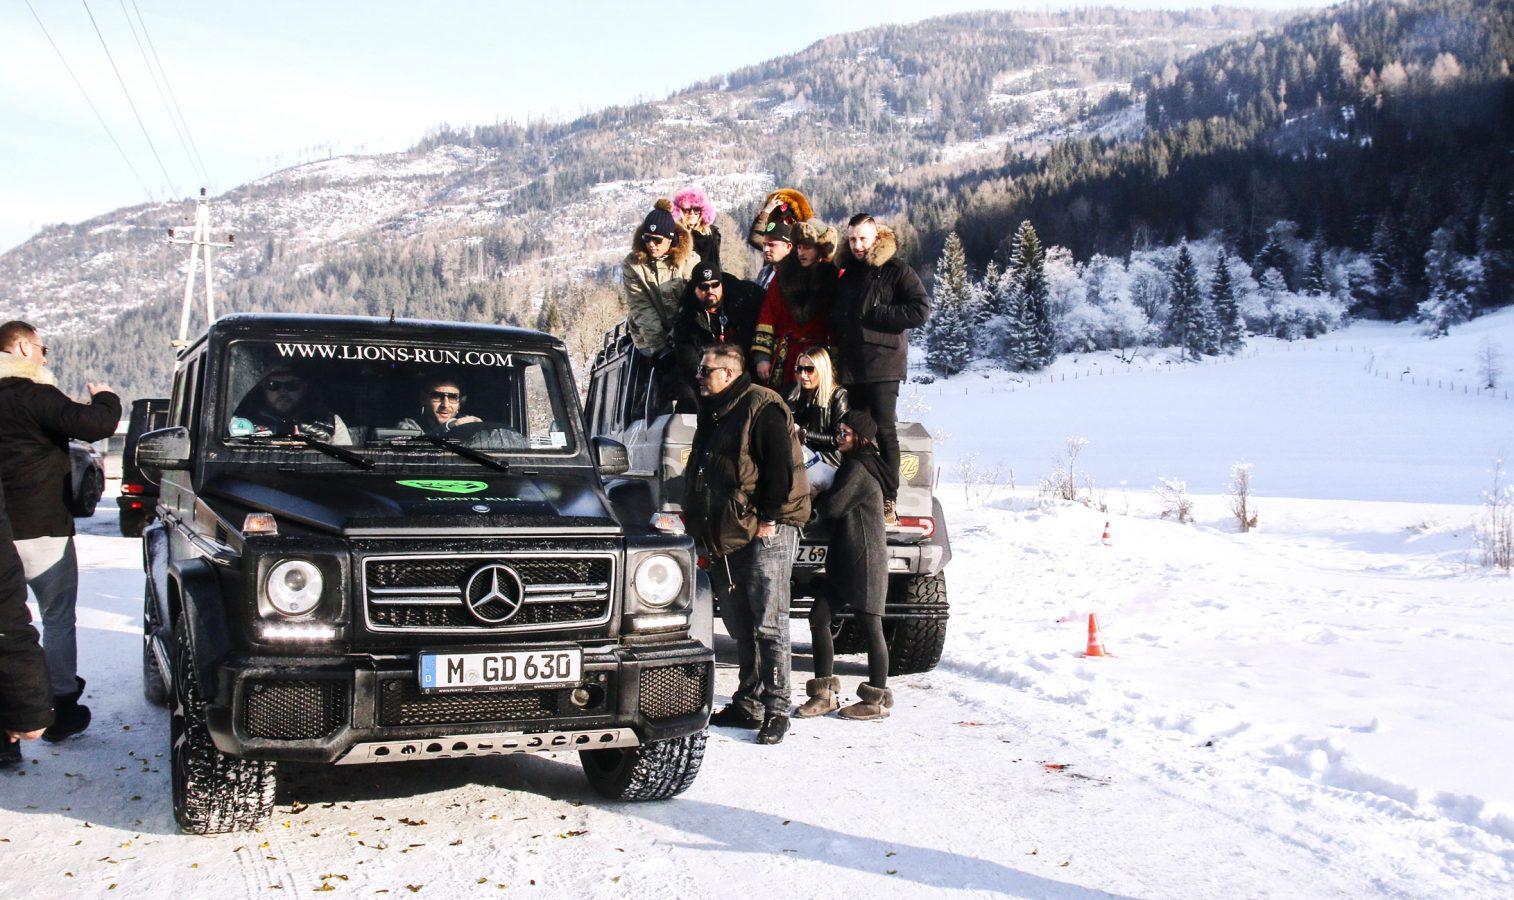 Lions_Run_winter_edition-2017_154-2